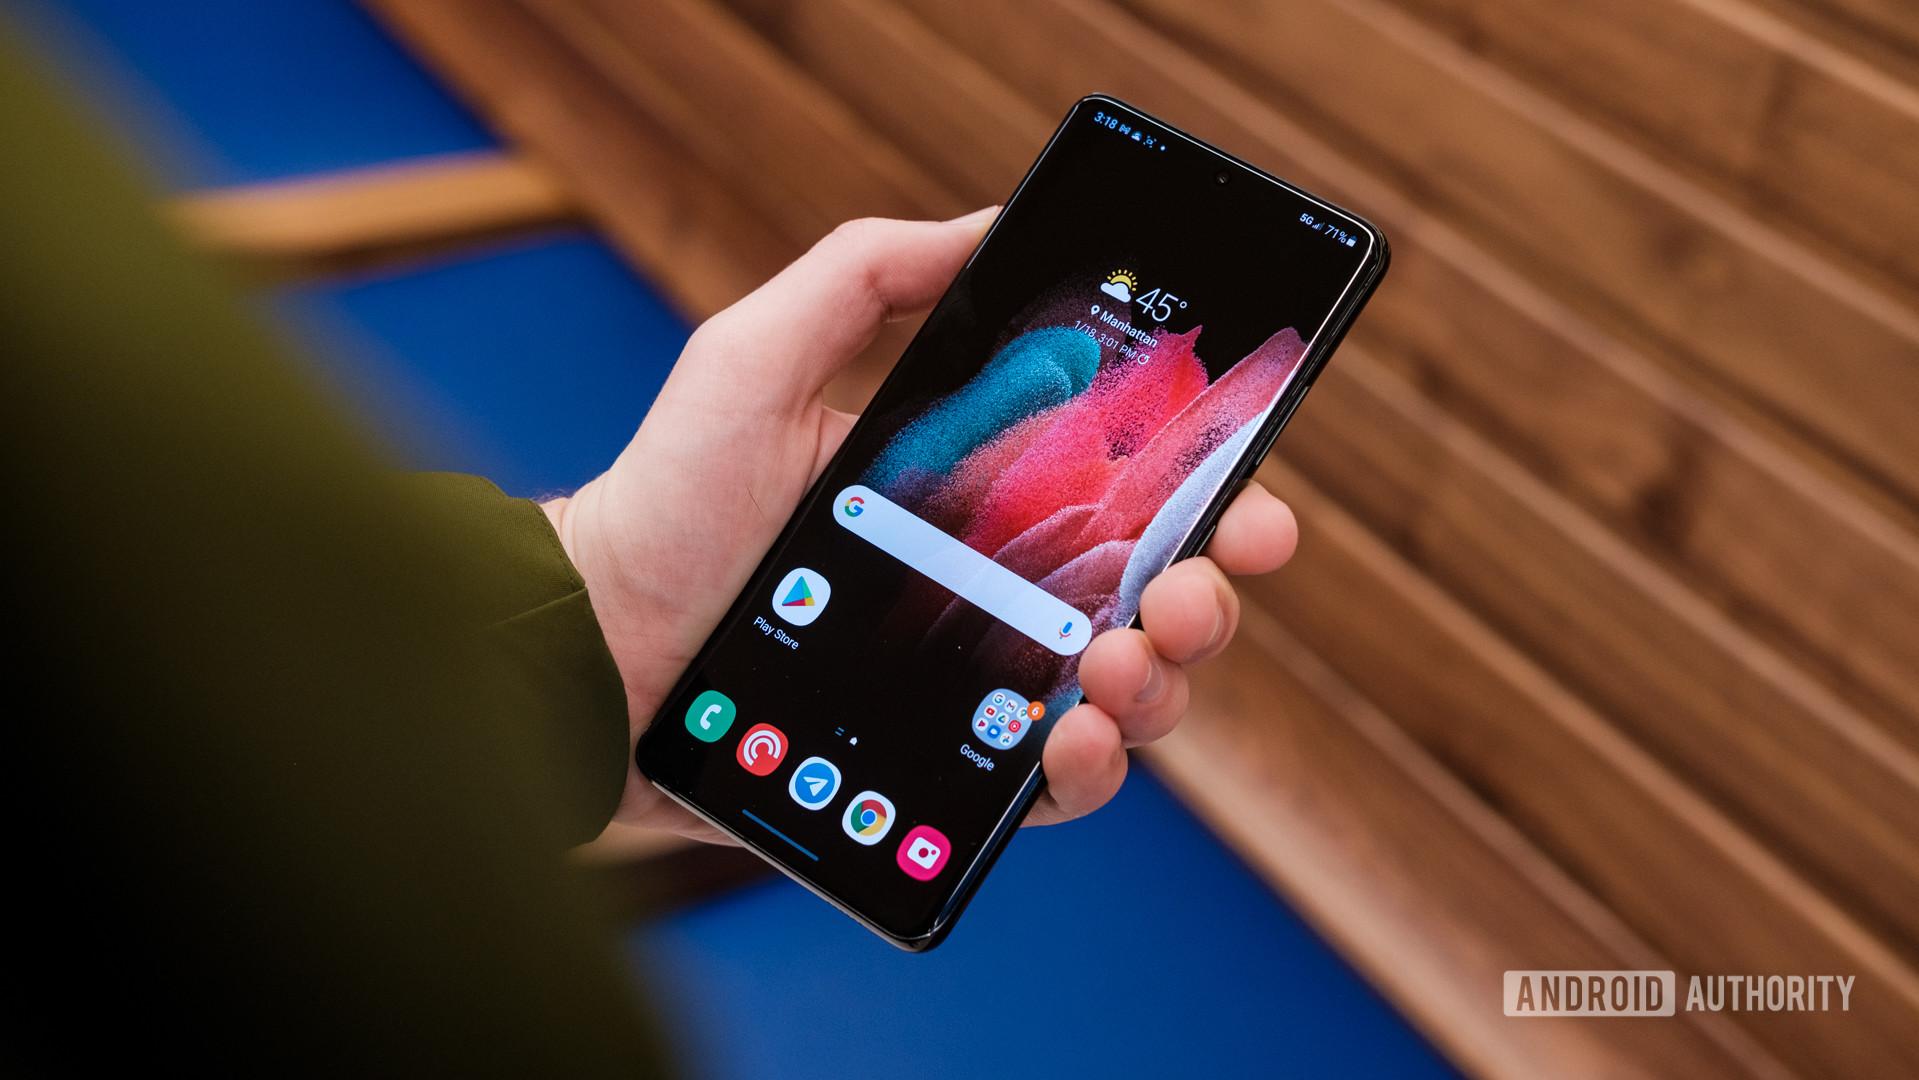 Samsung Galaxy S21 Ultra display in hand 1